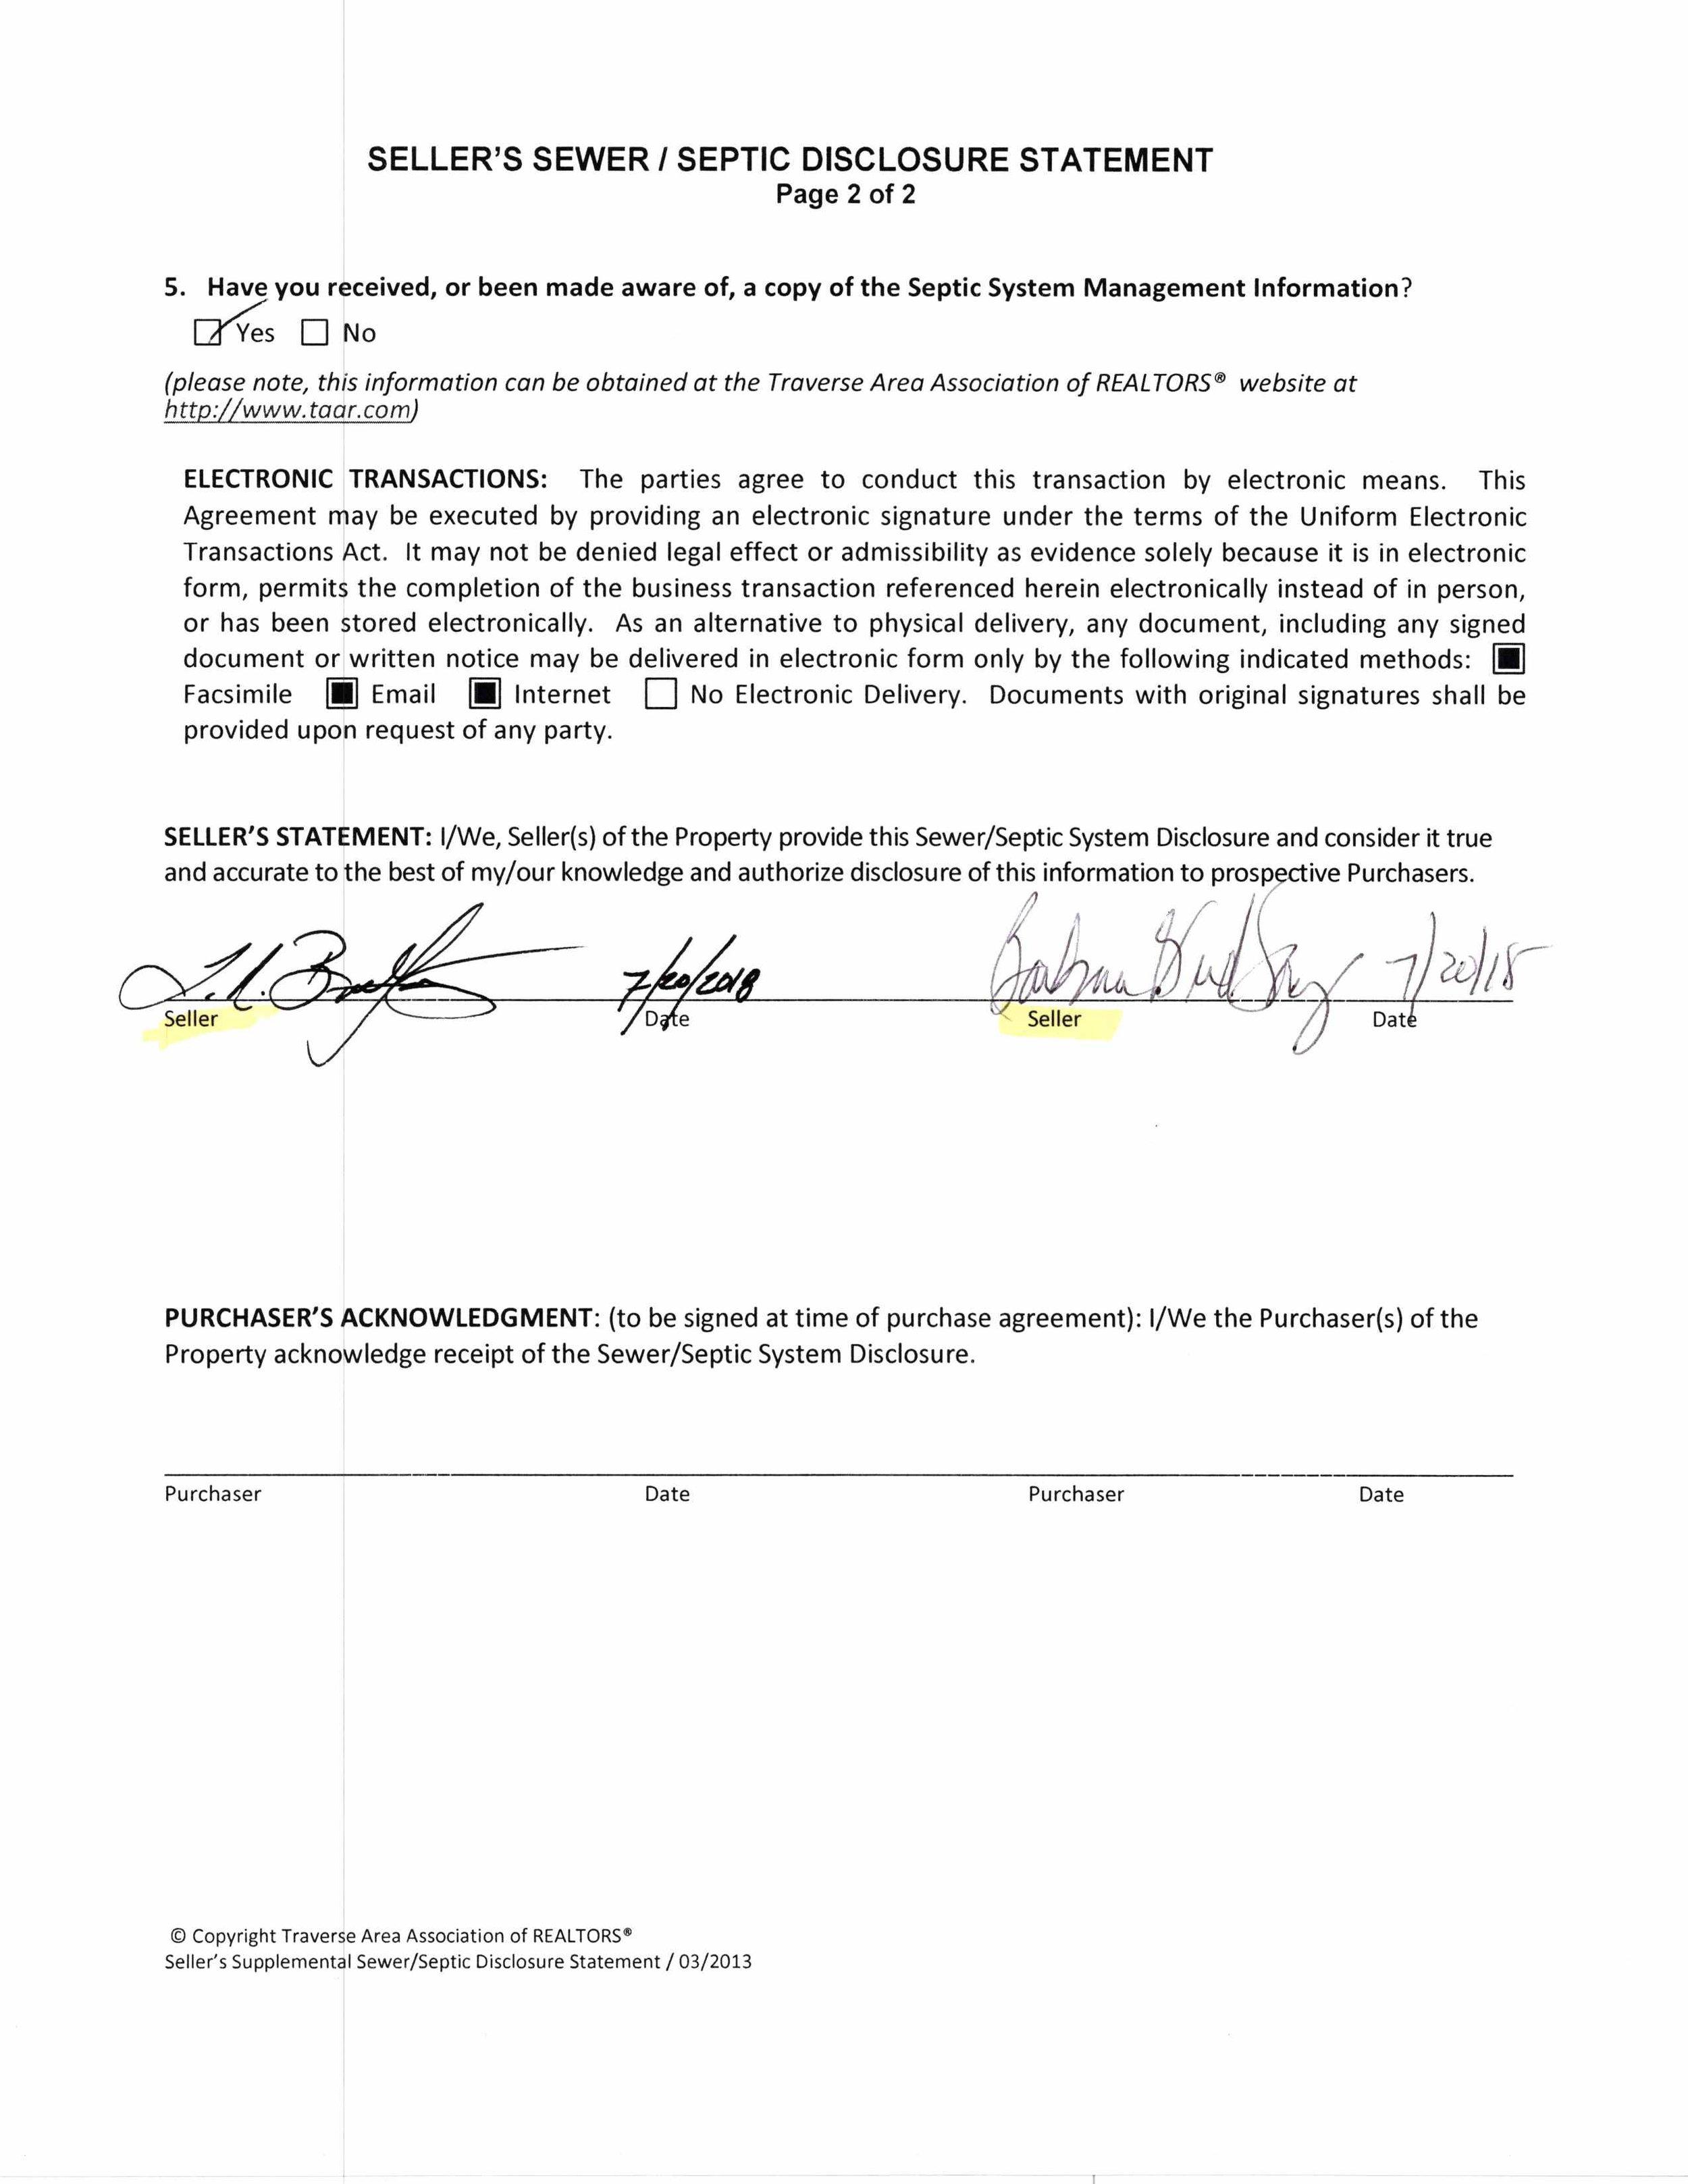 5500 E Hidden Beech, Cedar, MI - For sale by Oltersdorf Realty LLC - Marketing Packet (17).jpg